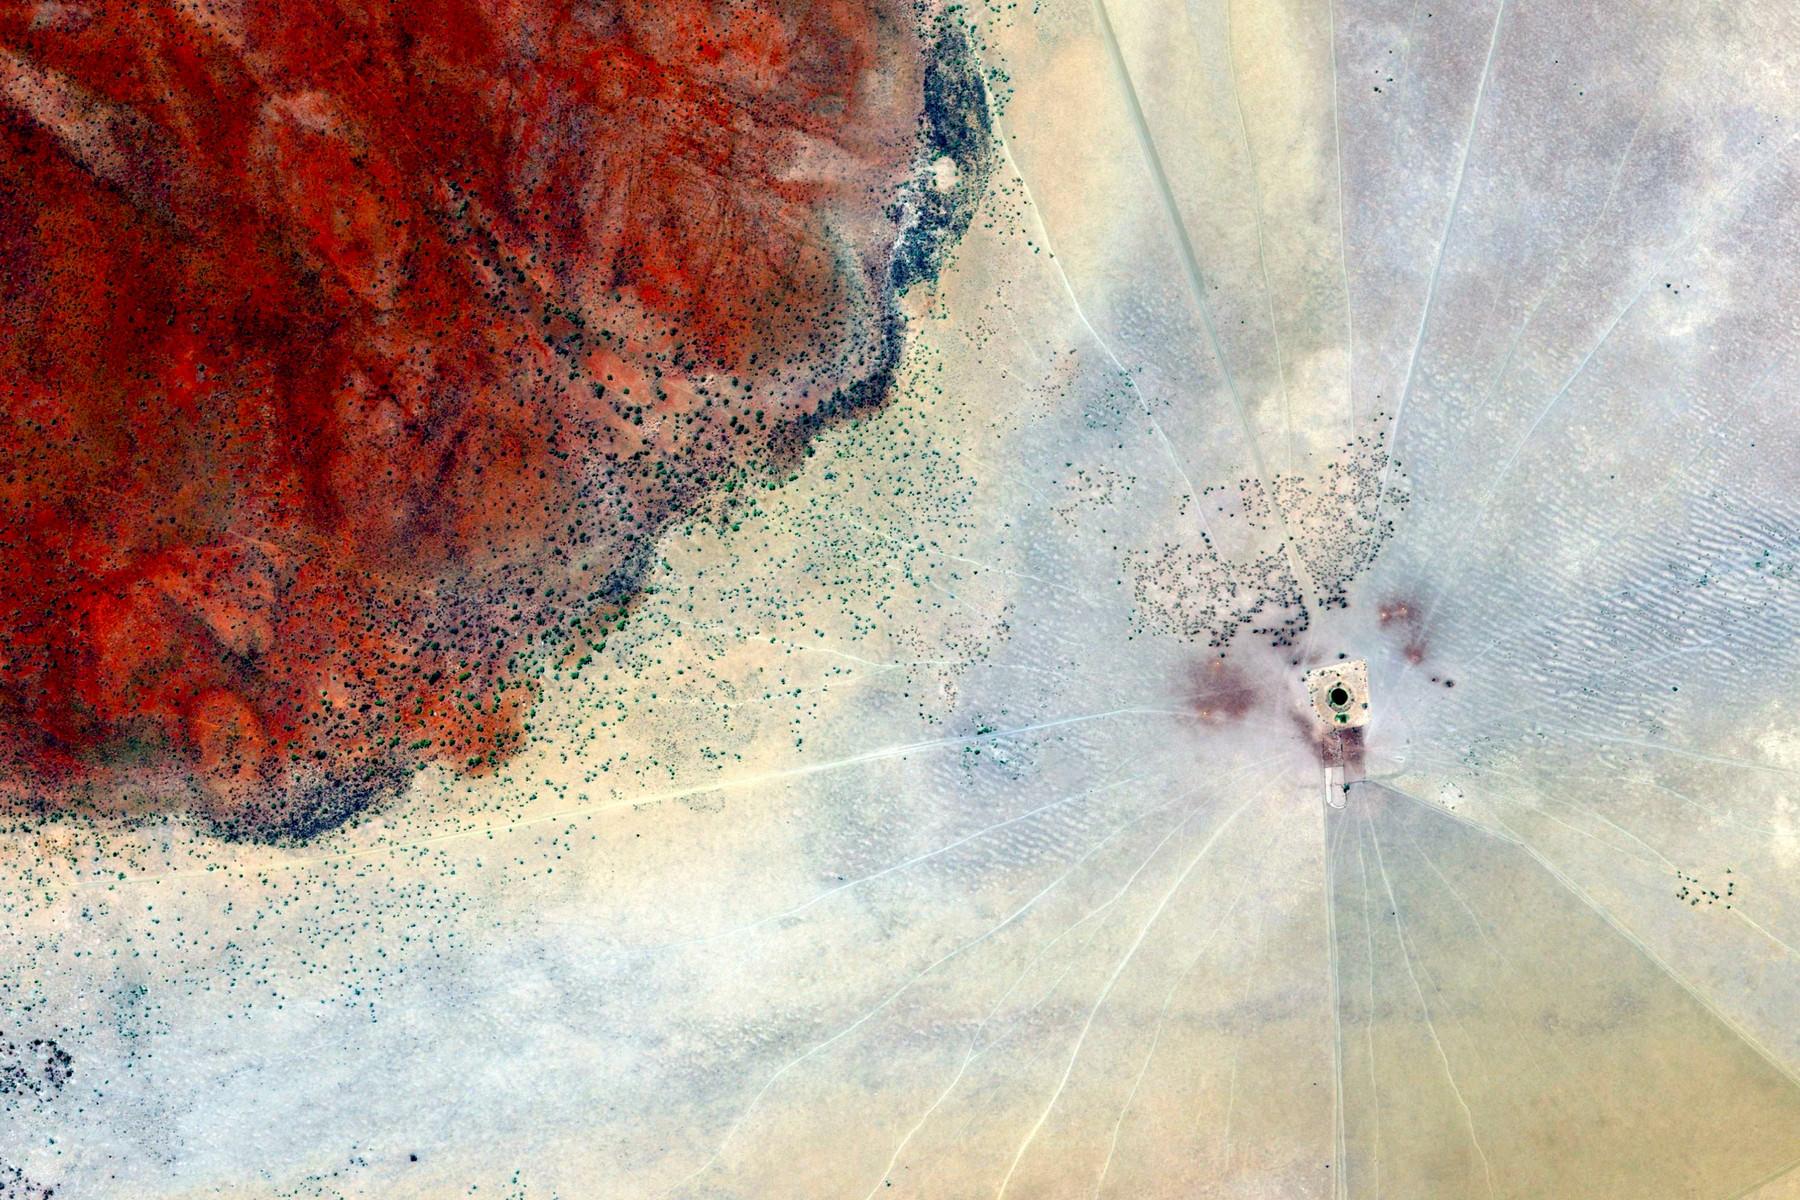 google-earth-Australia-Creswell-2388